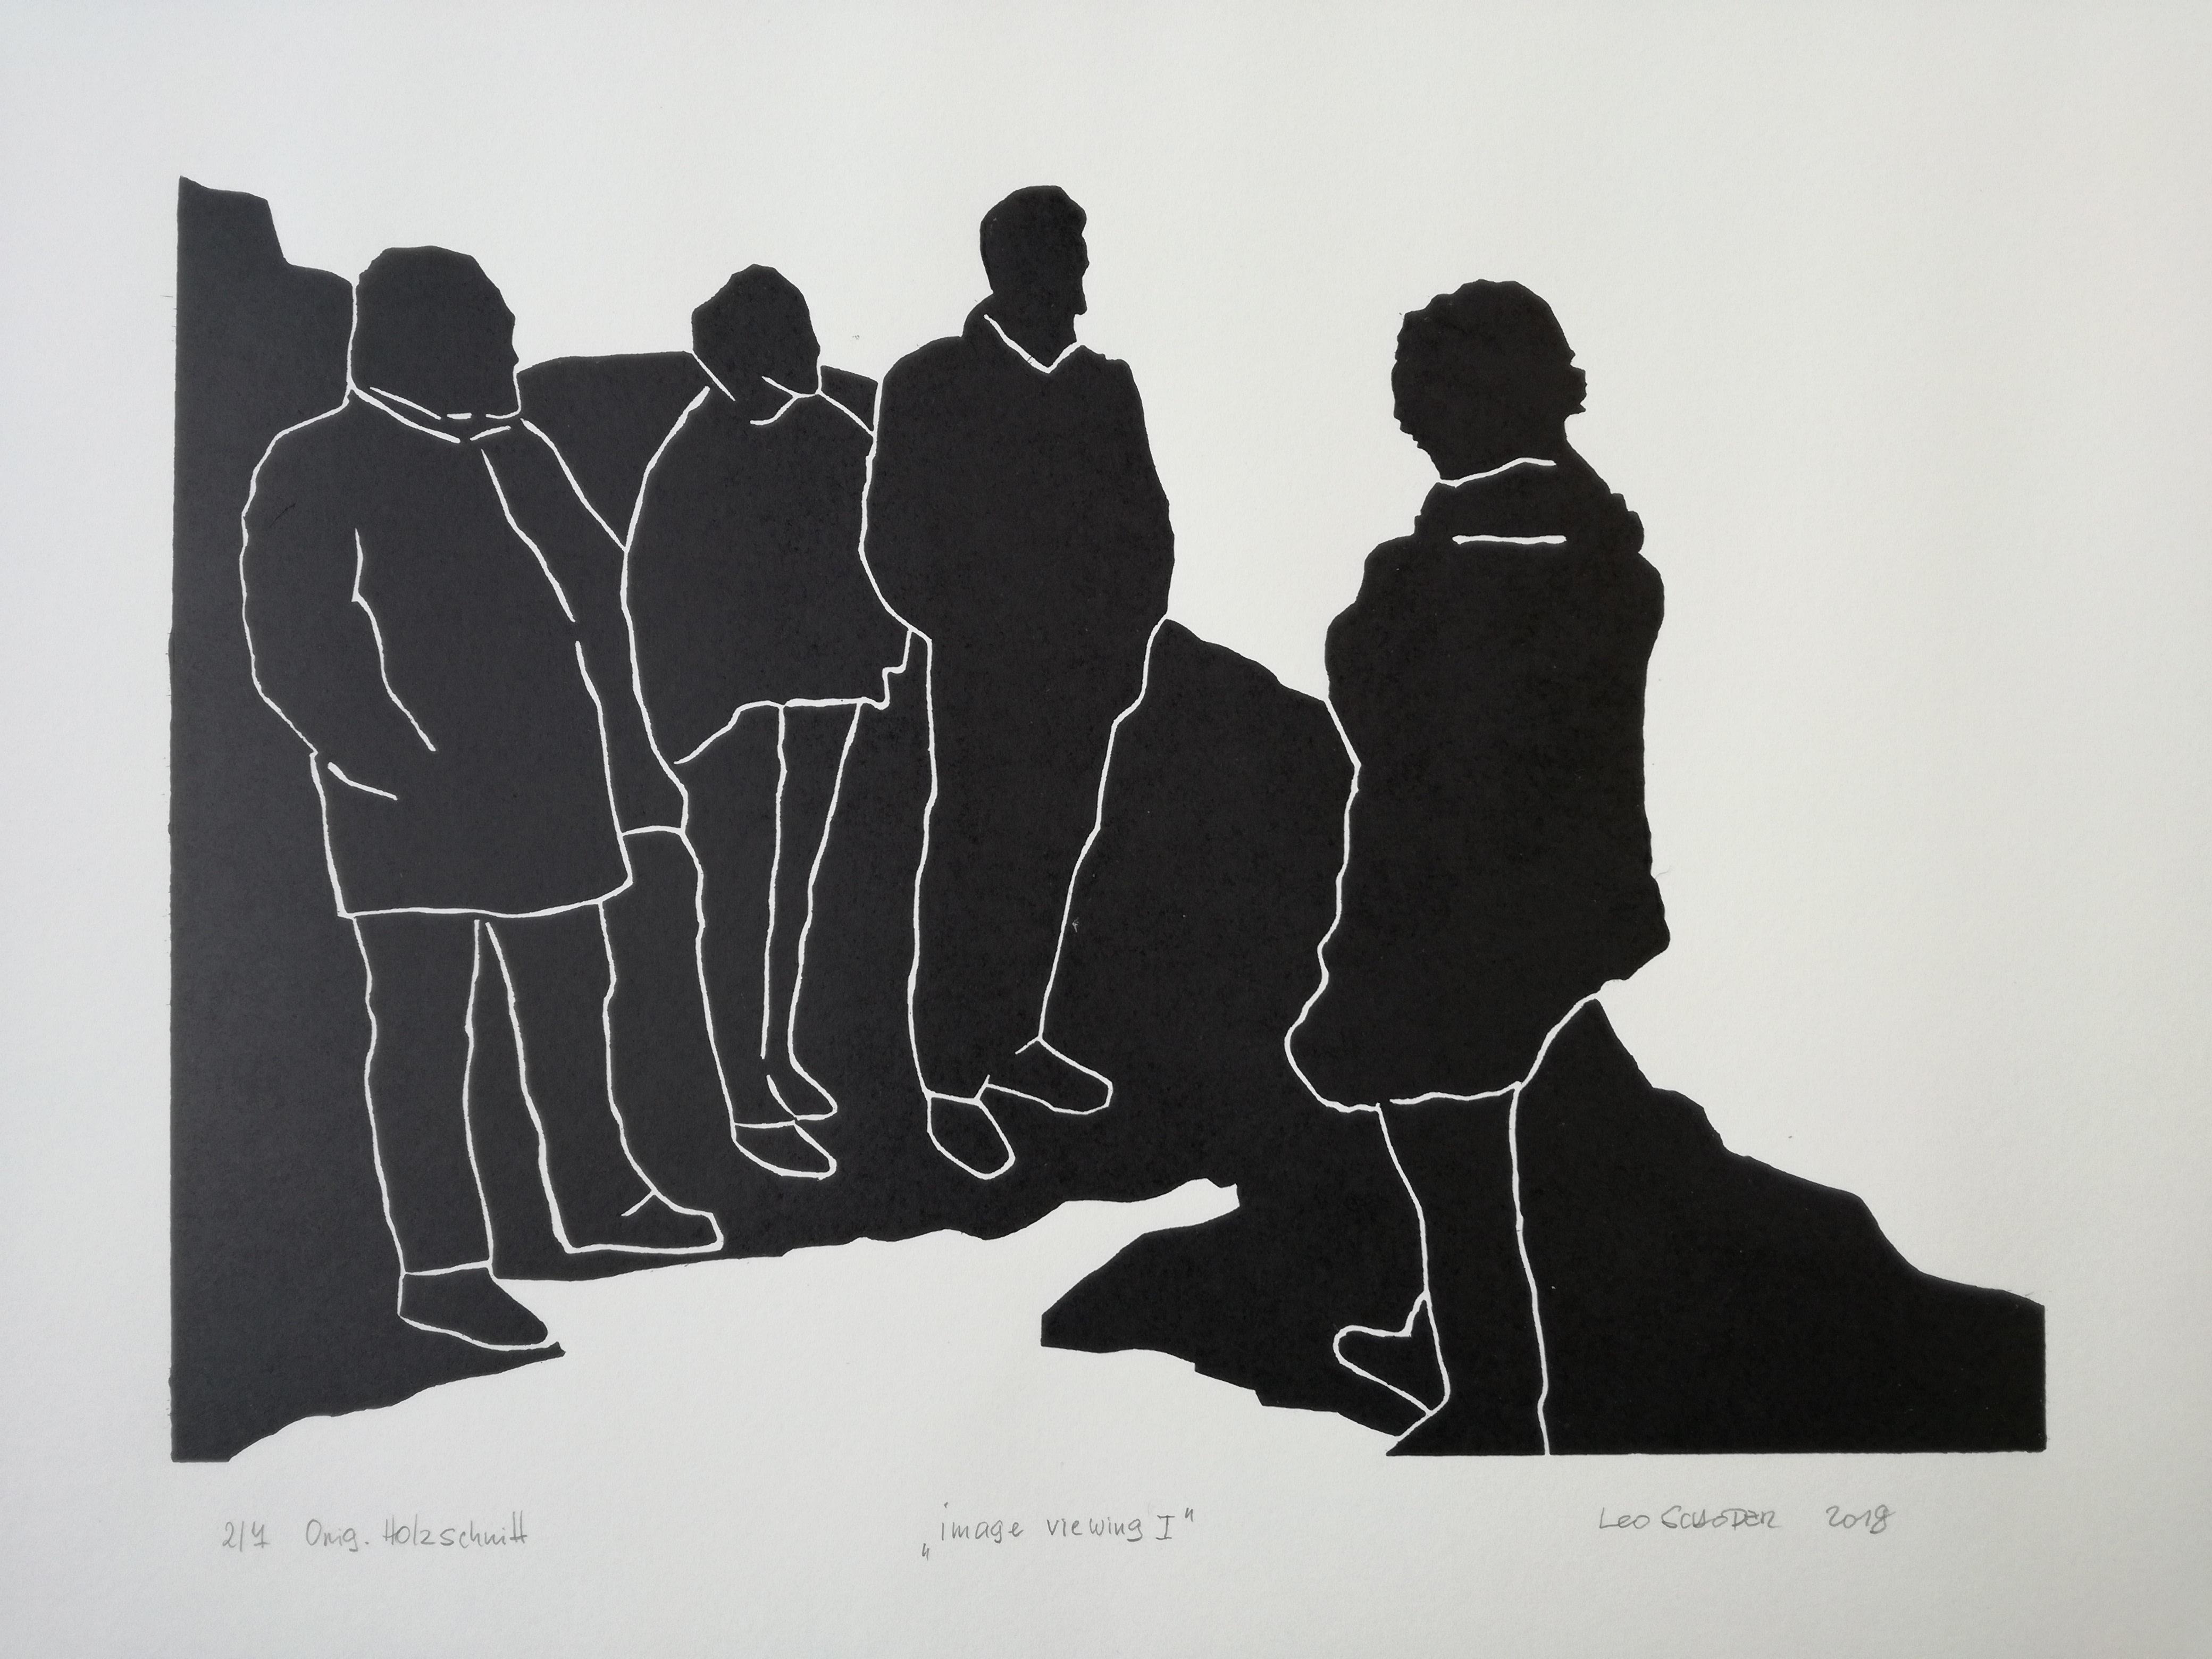 Leo Schoder image viewing 1 Holzschnitt.